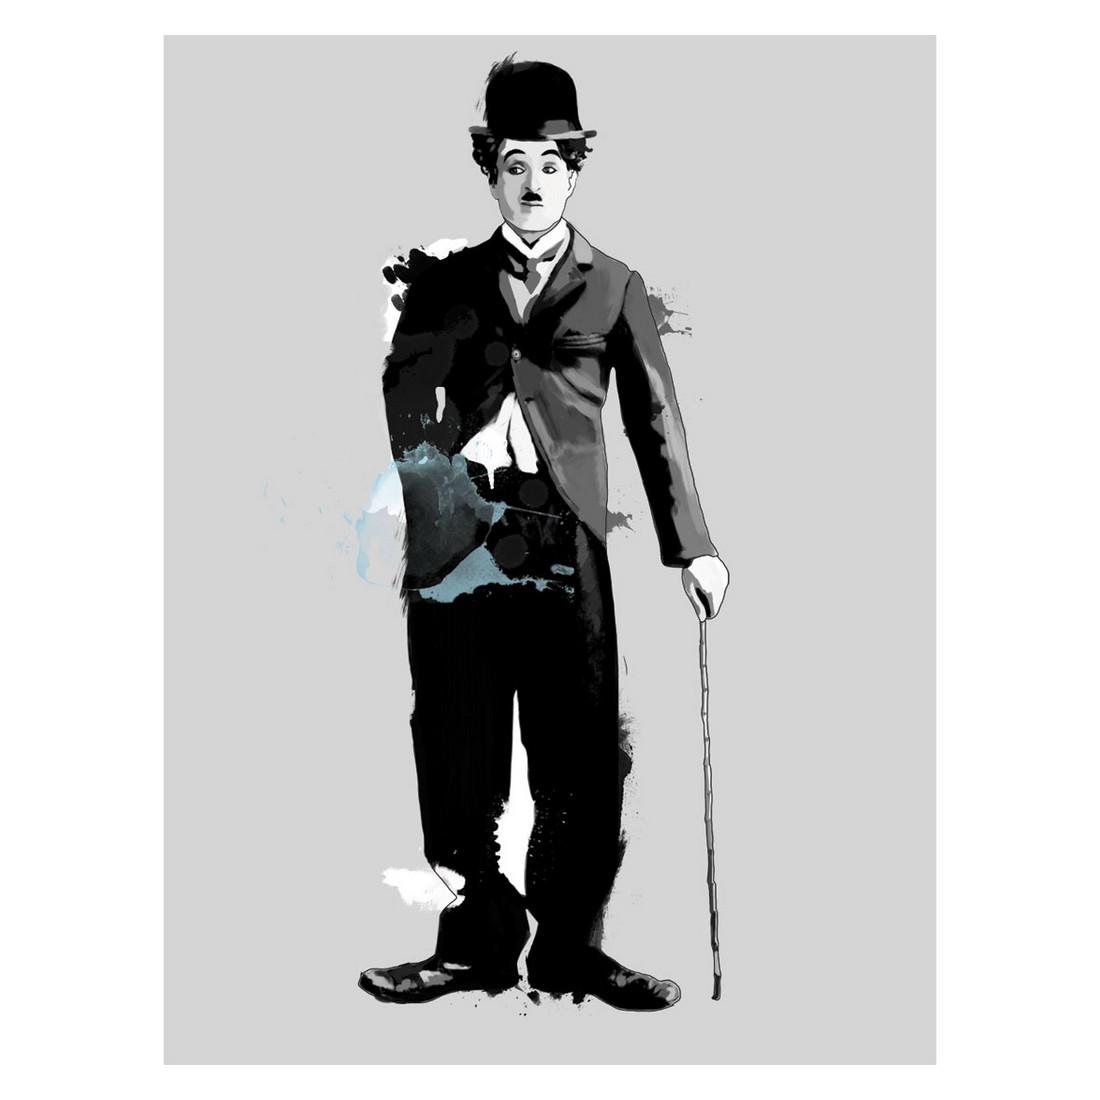 Ölgemälde Charlie Chaplin – Größe 100 x 70 cm, yourPainting kaufen